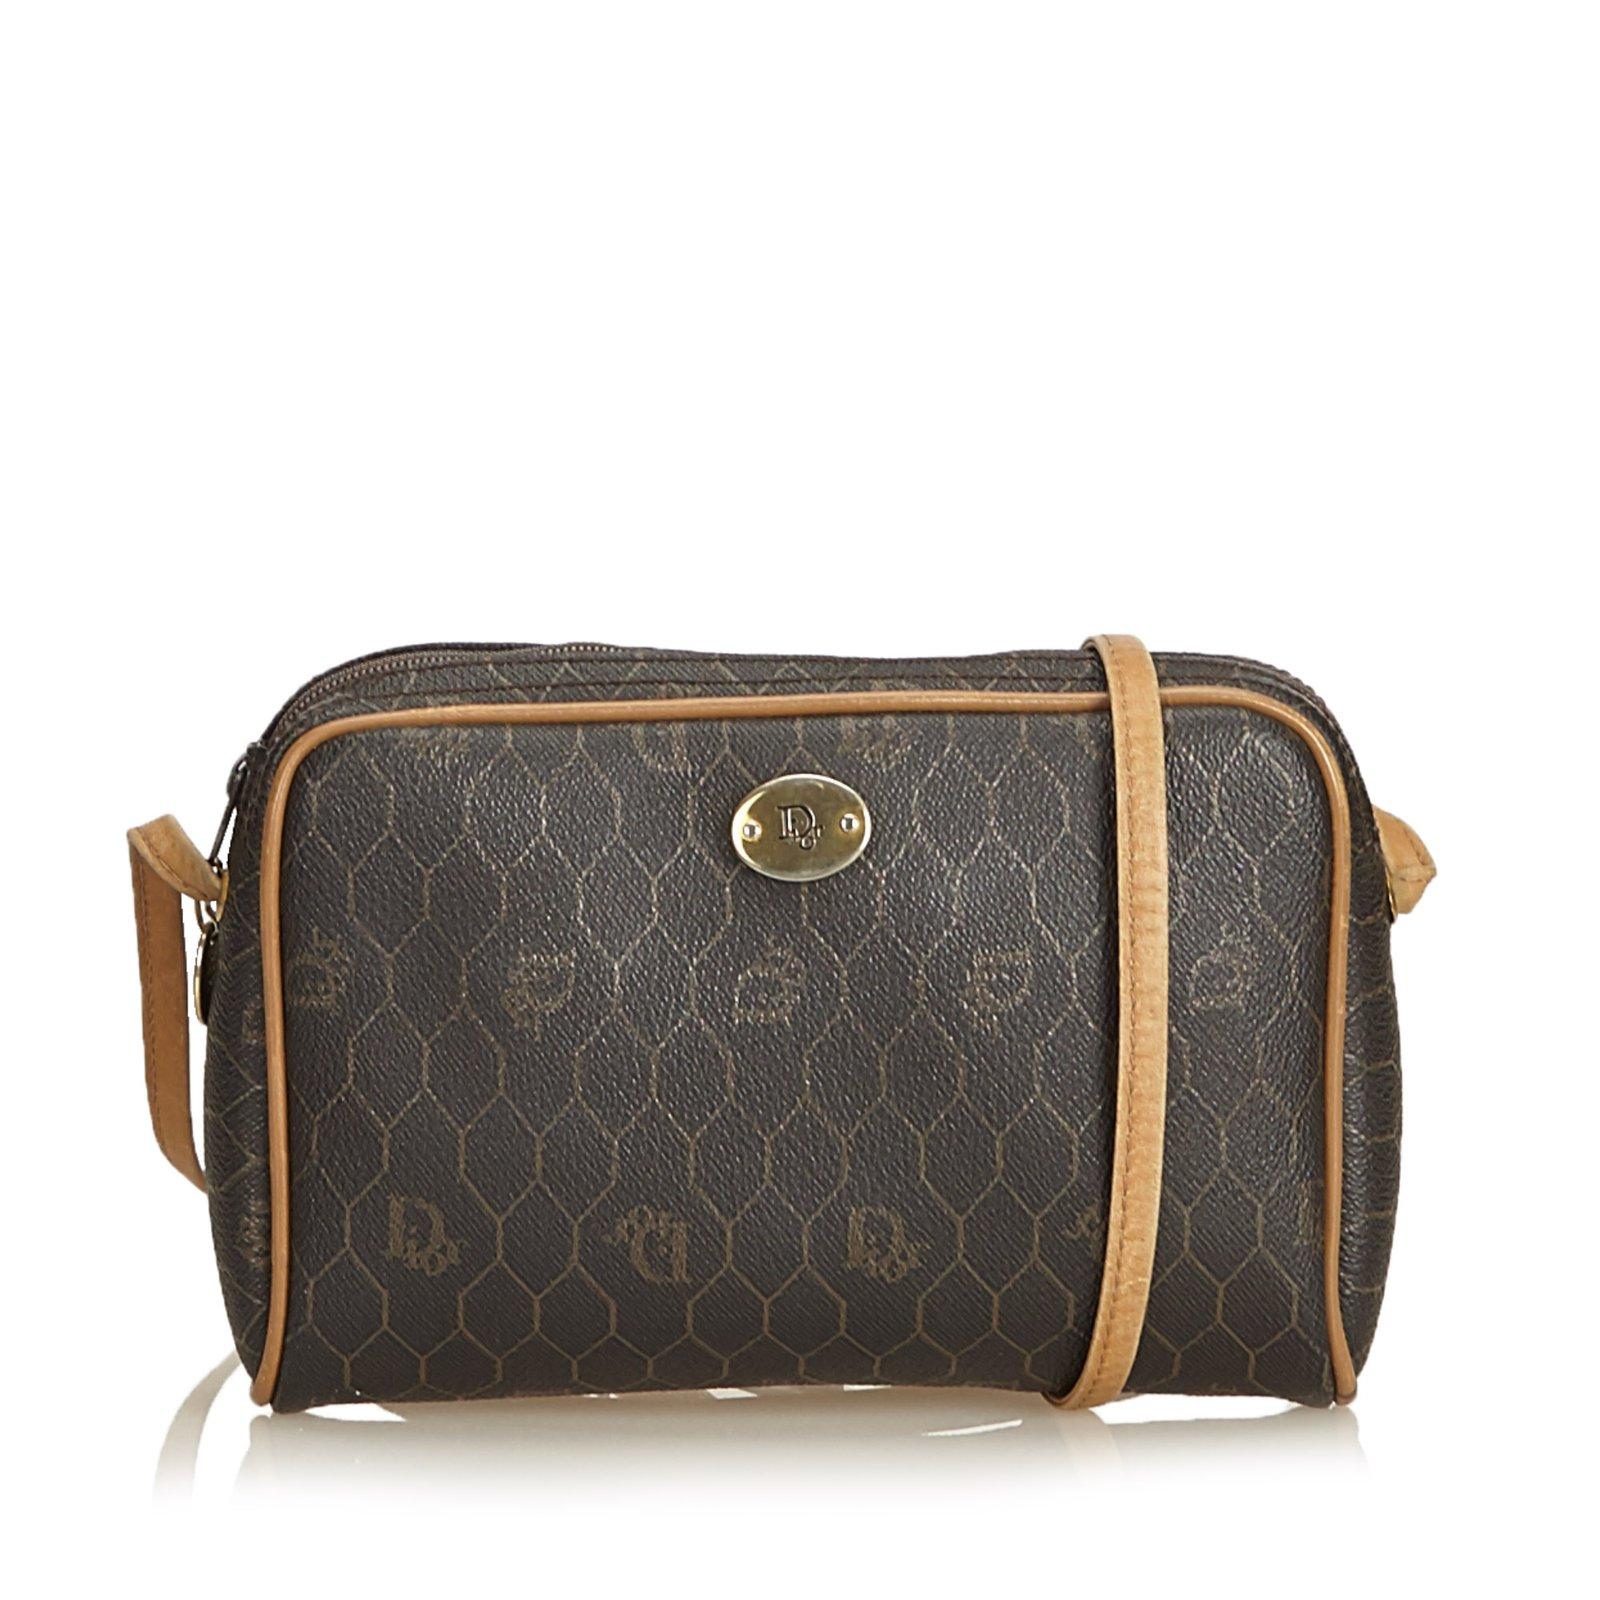 8dc768b8998e Dior honeycomb coated canvas crossbody bag handbags leather other cloth  brown jpg 1600x1600 Dior cross body